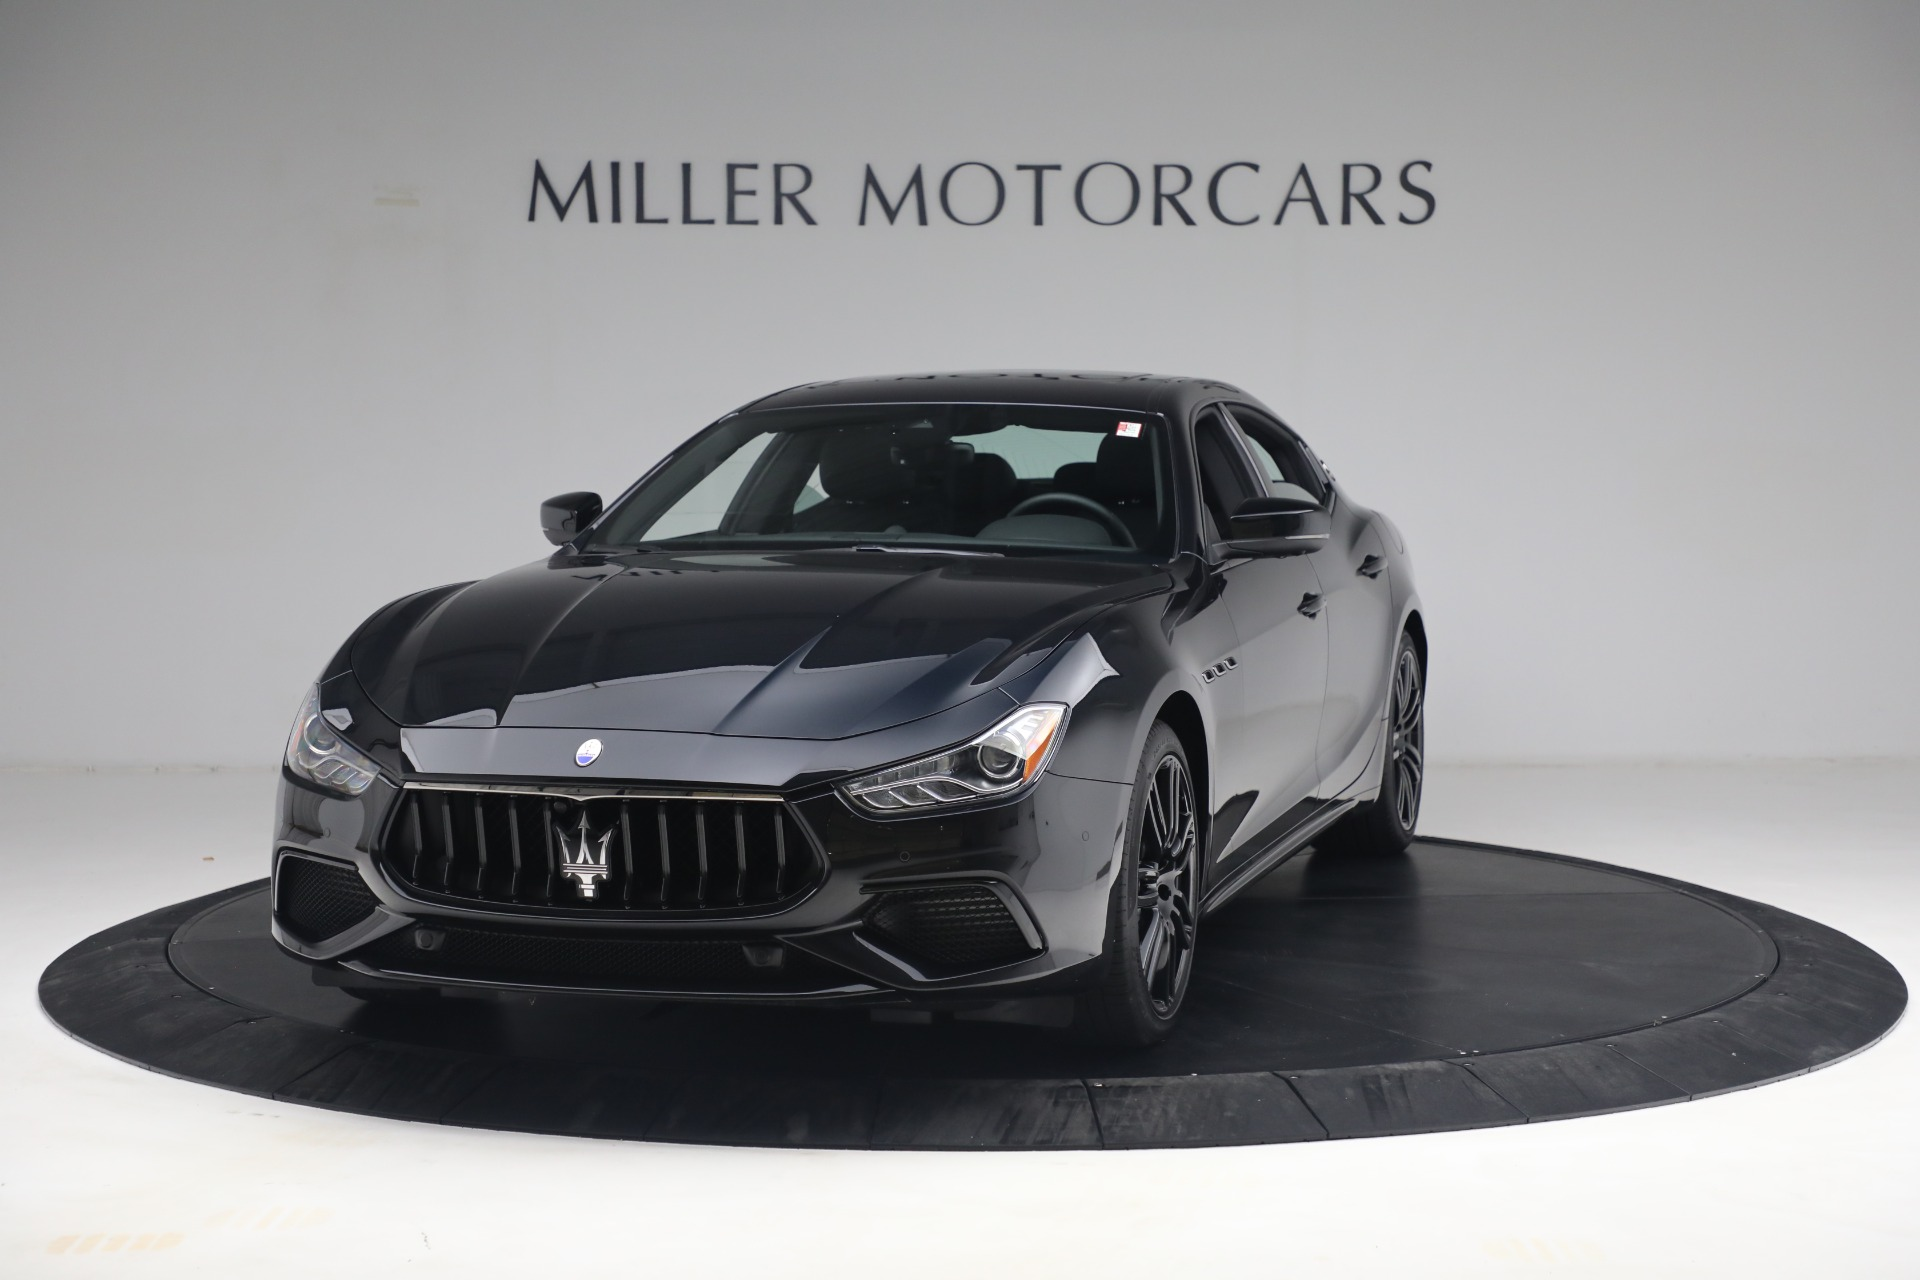 New 2021 Maserati Ghibli SQ4 for sale $92,894 at Bentley Greenwich in Greenwich CT 06830 1